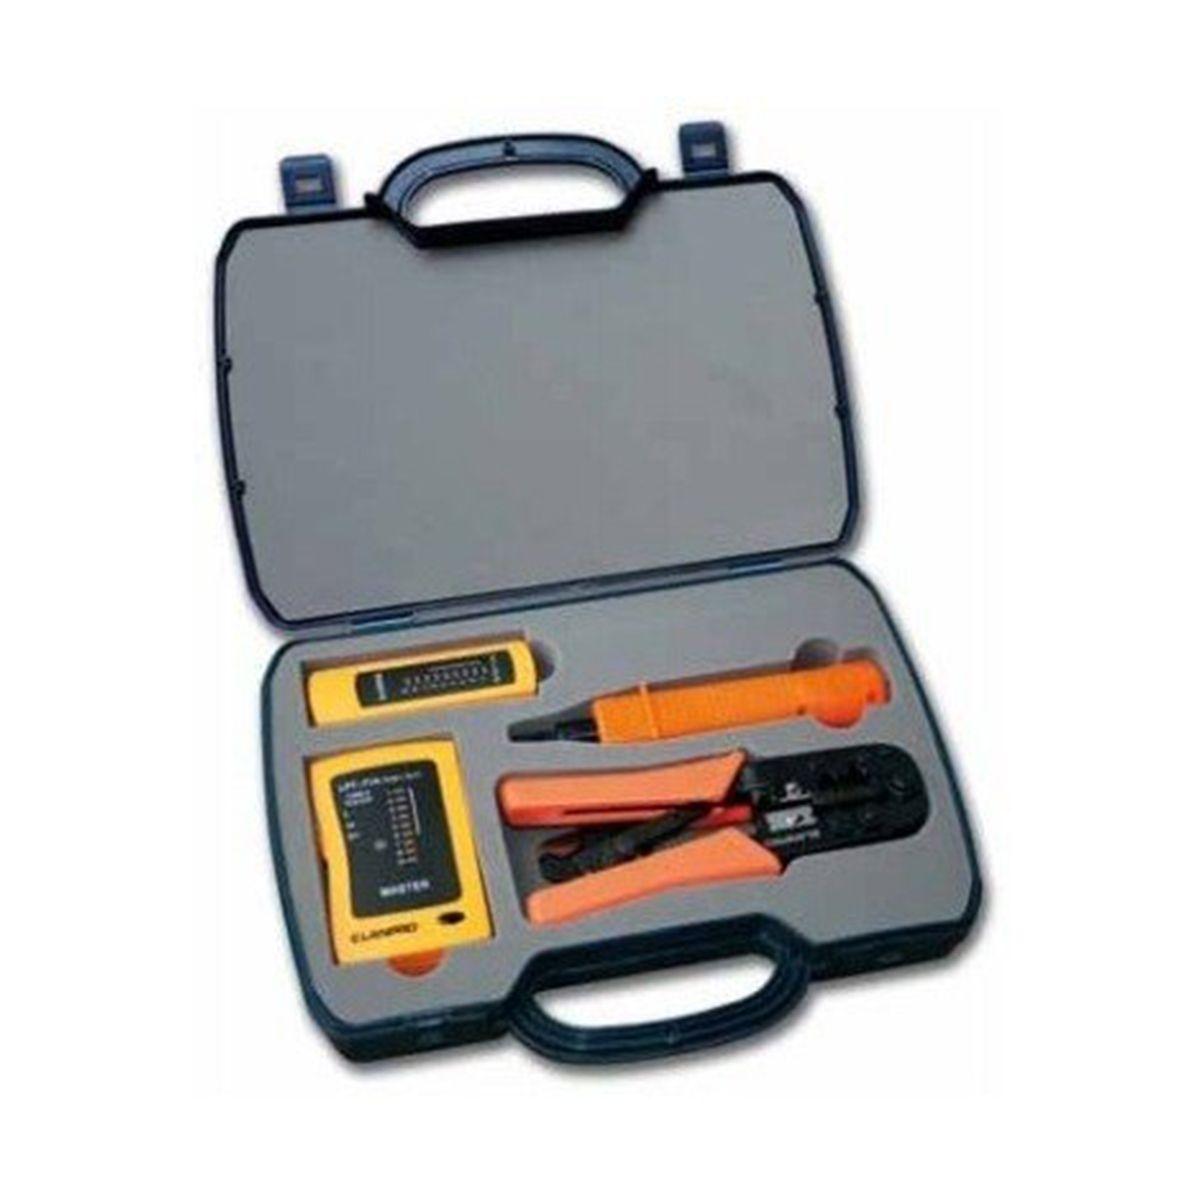 Kit Profesional  de Herramientas para Redes  LPT-KT101 LPT-KT101